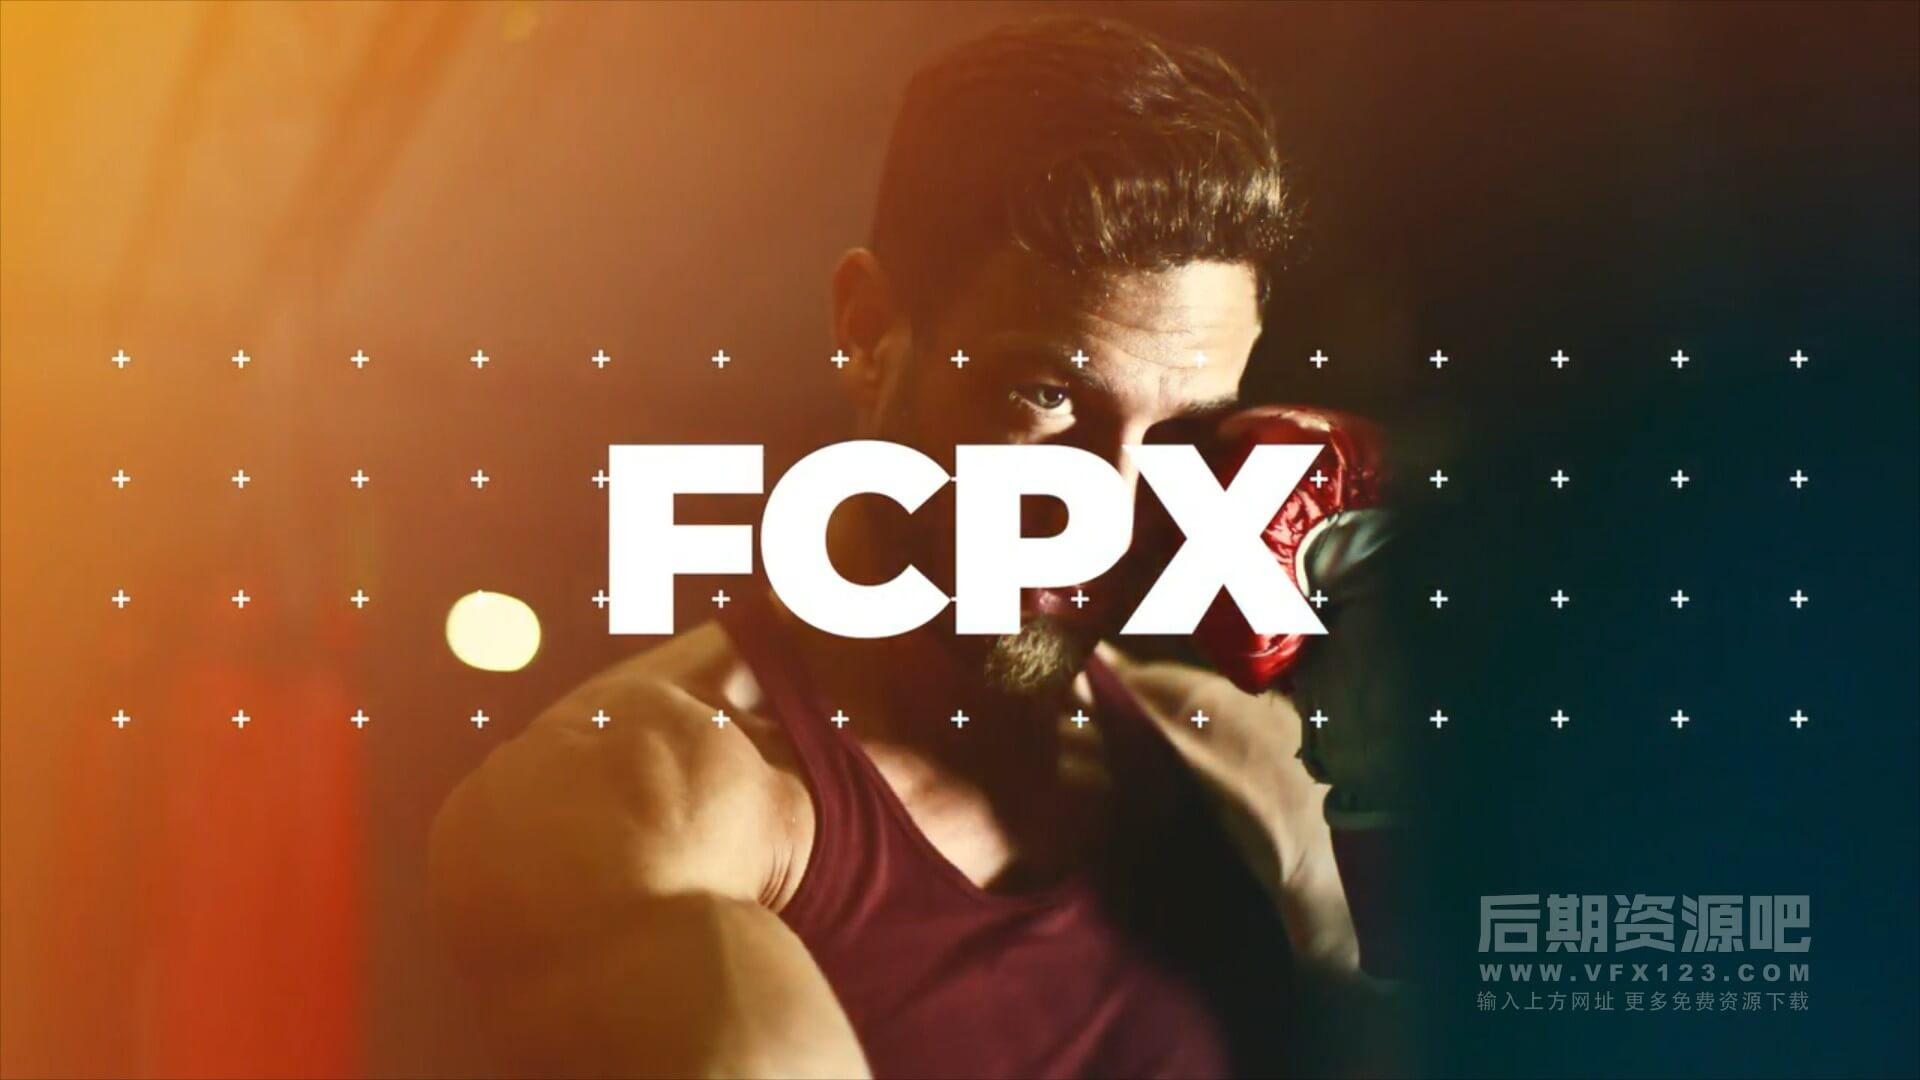 fcpx主题模板 流行动感卡点体育运动宣传片头 Dynamic sport